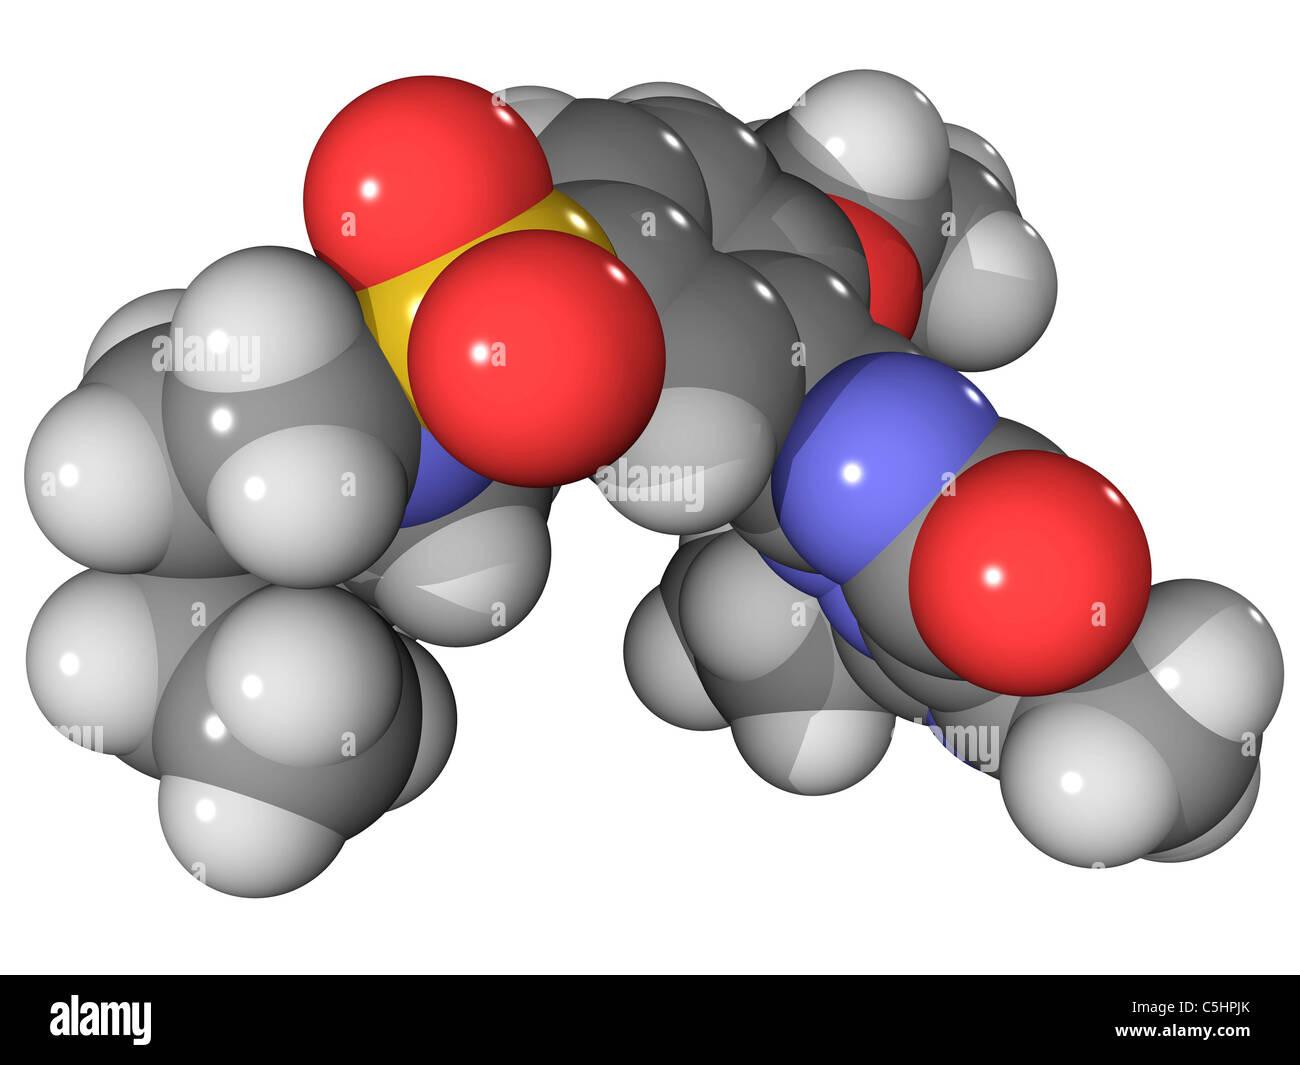 Vardenafil erectile dysfunction drug - Stock Image